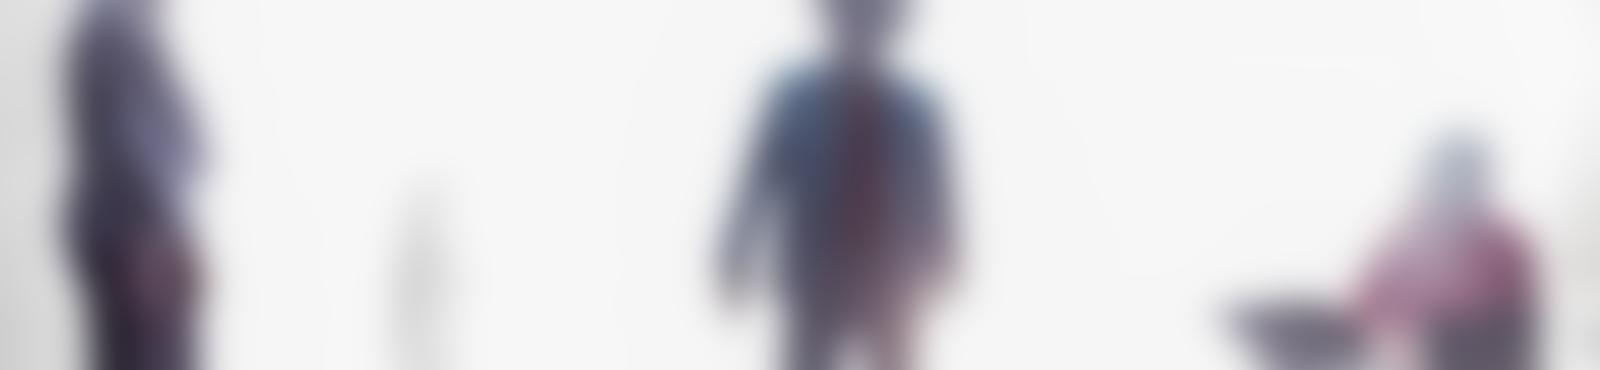 Blurred ad45bd94 2a6c 4092 8414 f3d7a8e62f60